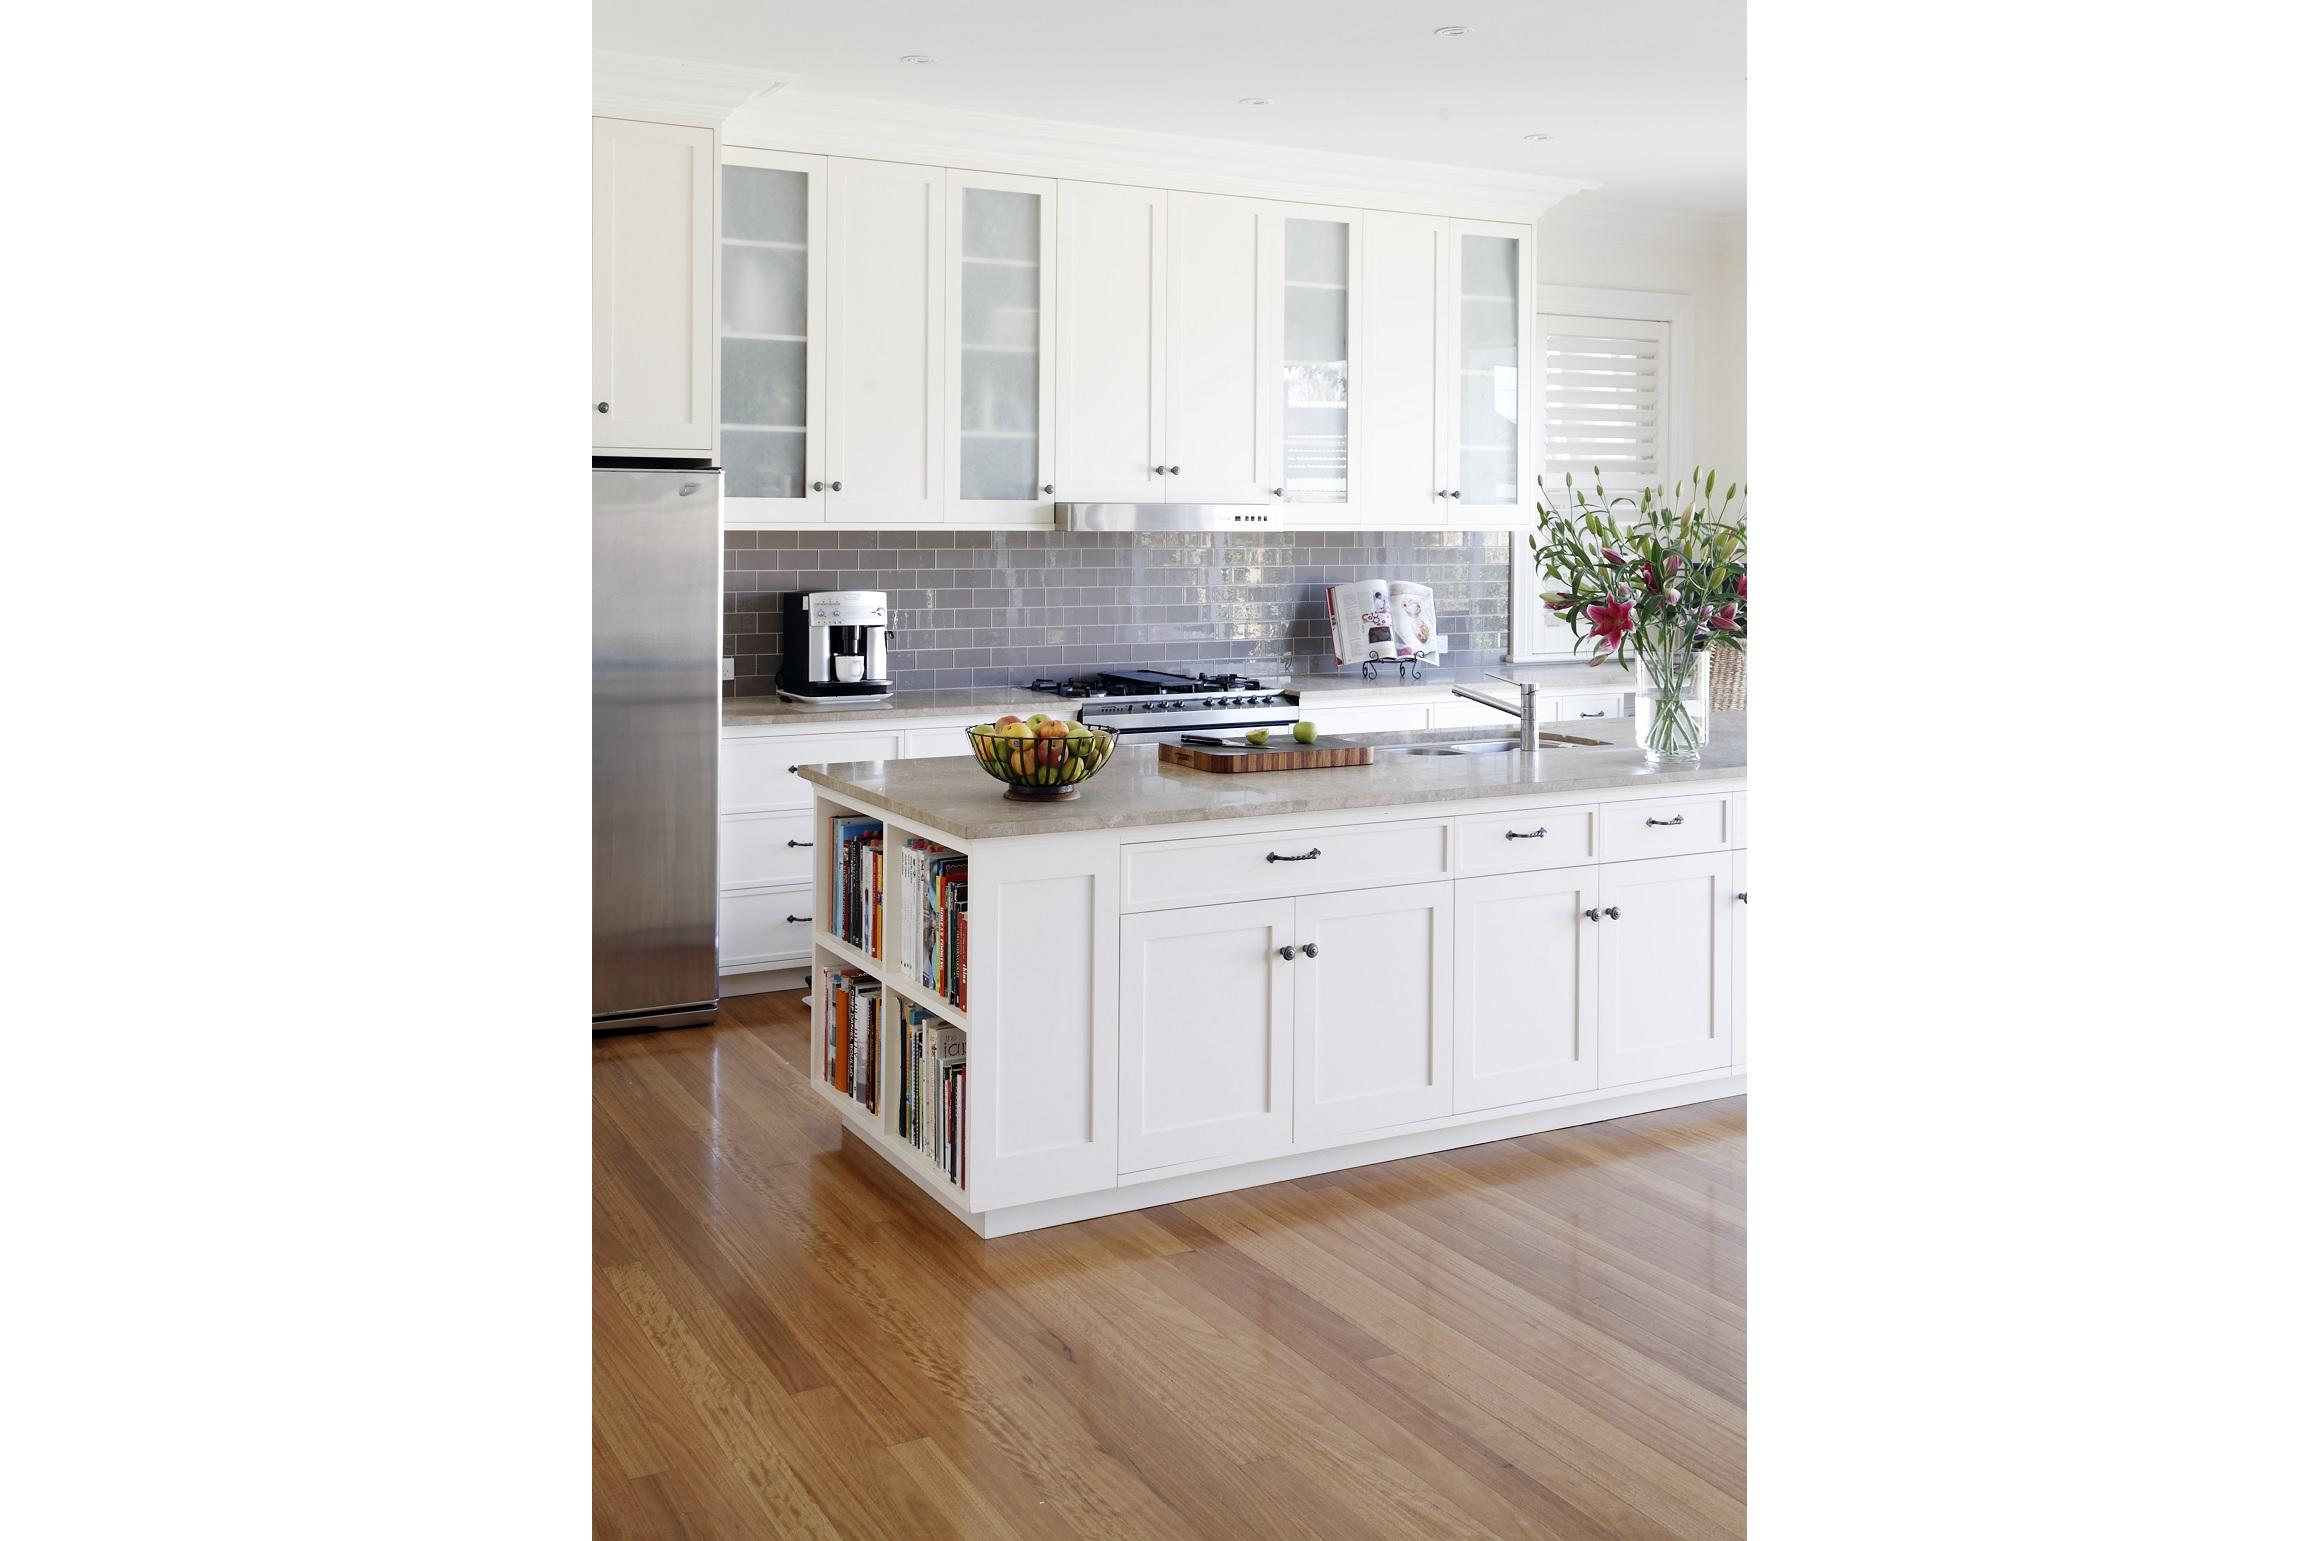 Interior-Design-Sydney-Kitchen-Renovation-Michael-Bell-Architects(2)